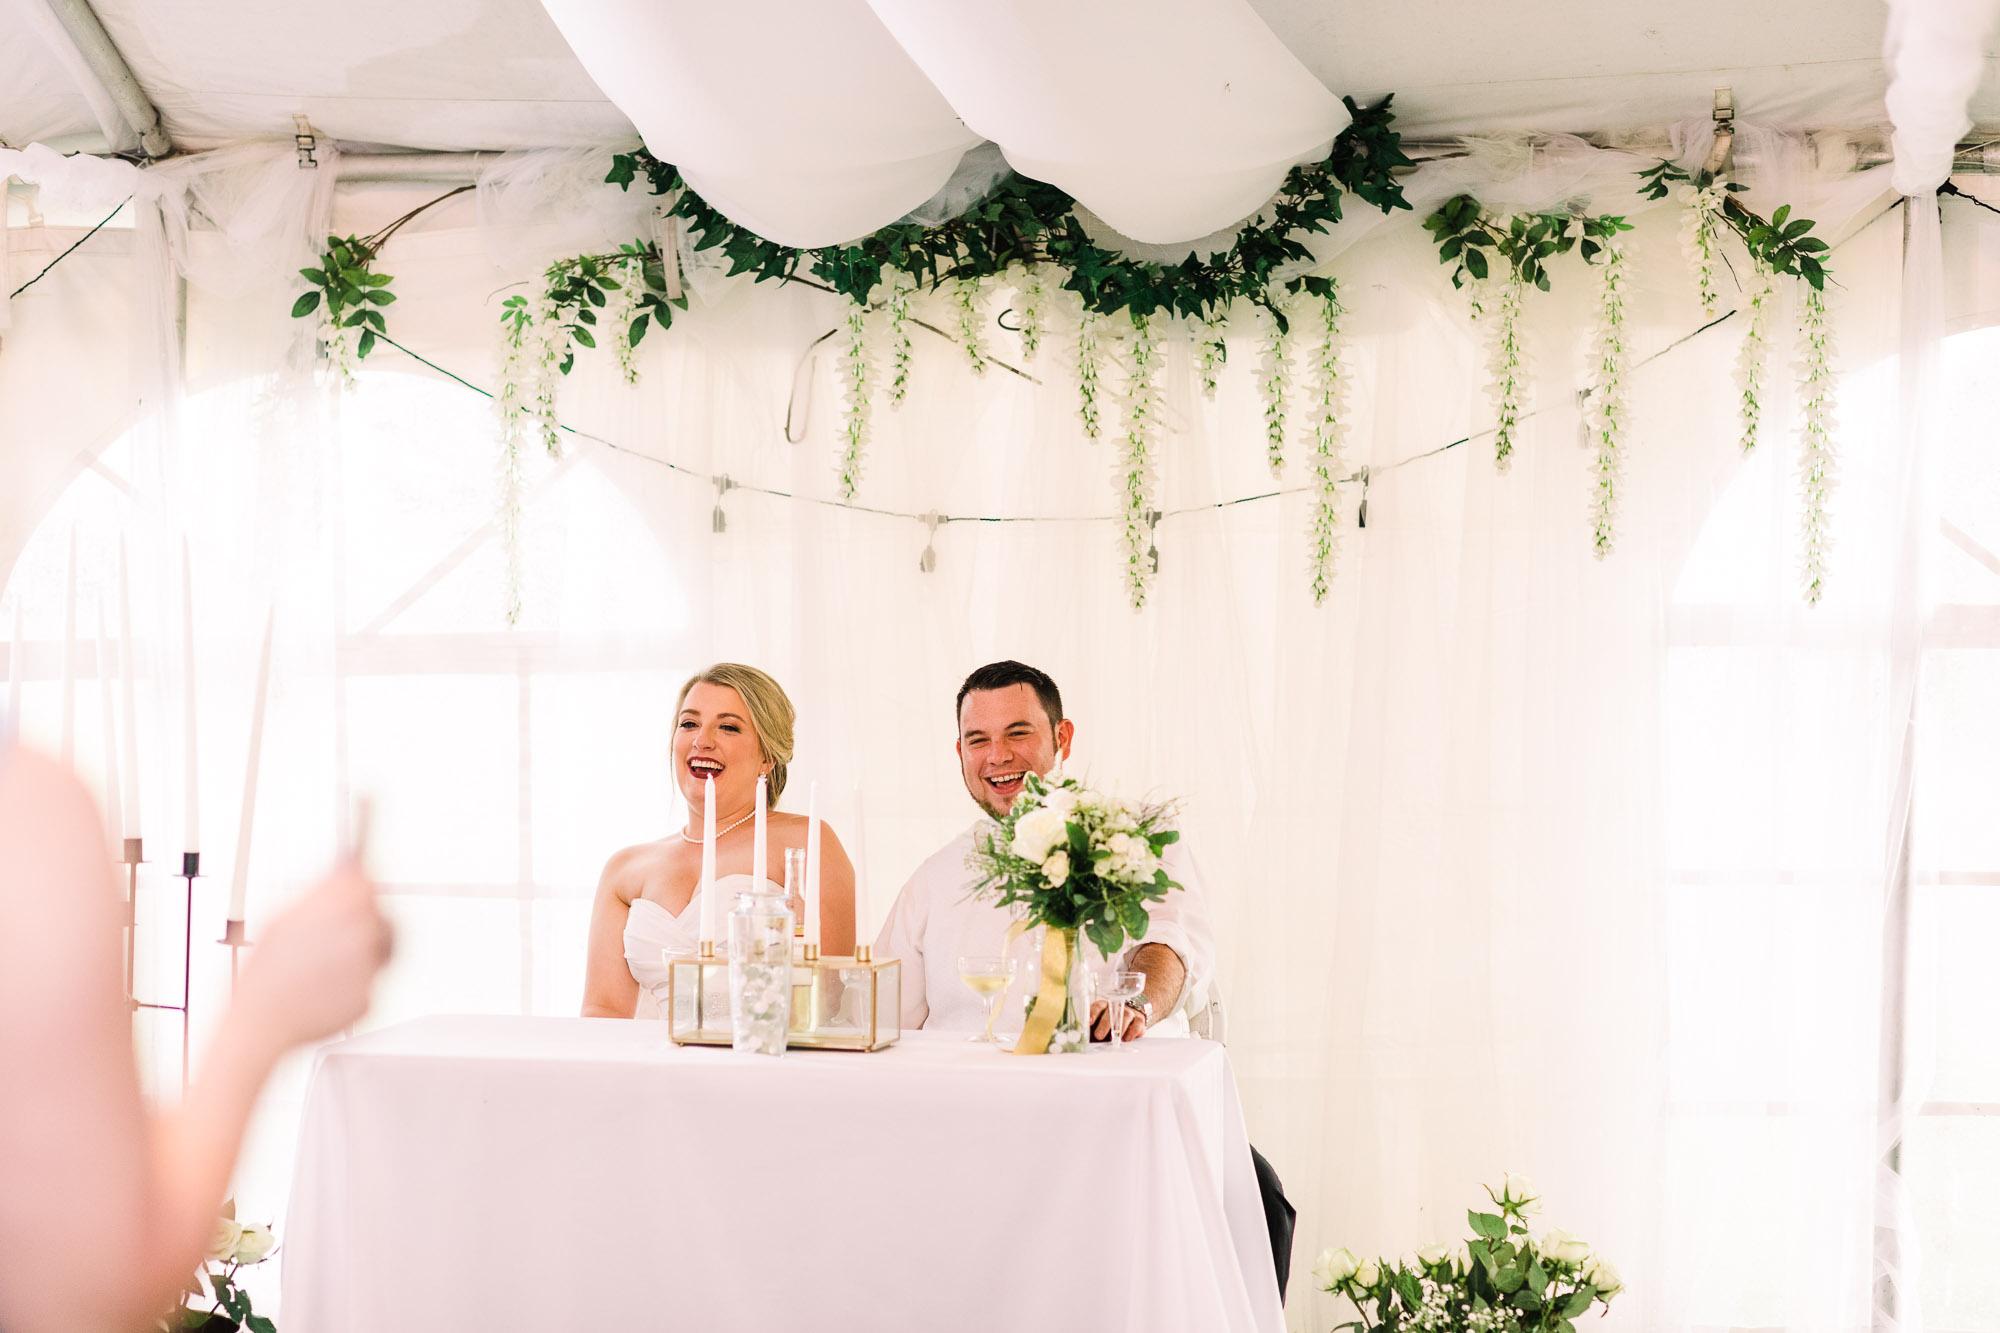 isle-of-que-wedding-4282.jpg